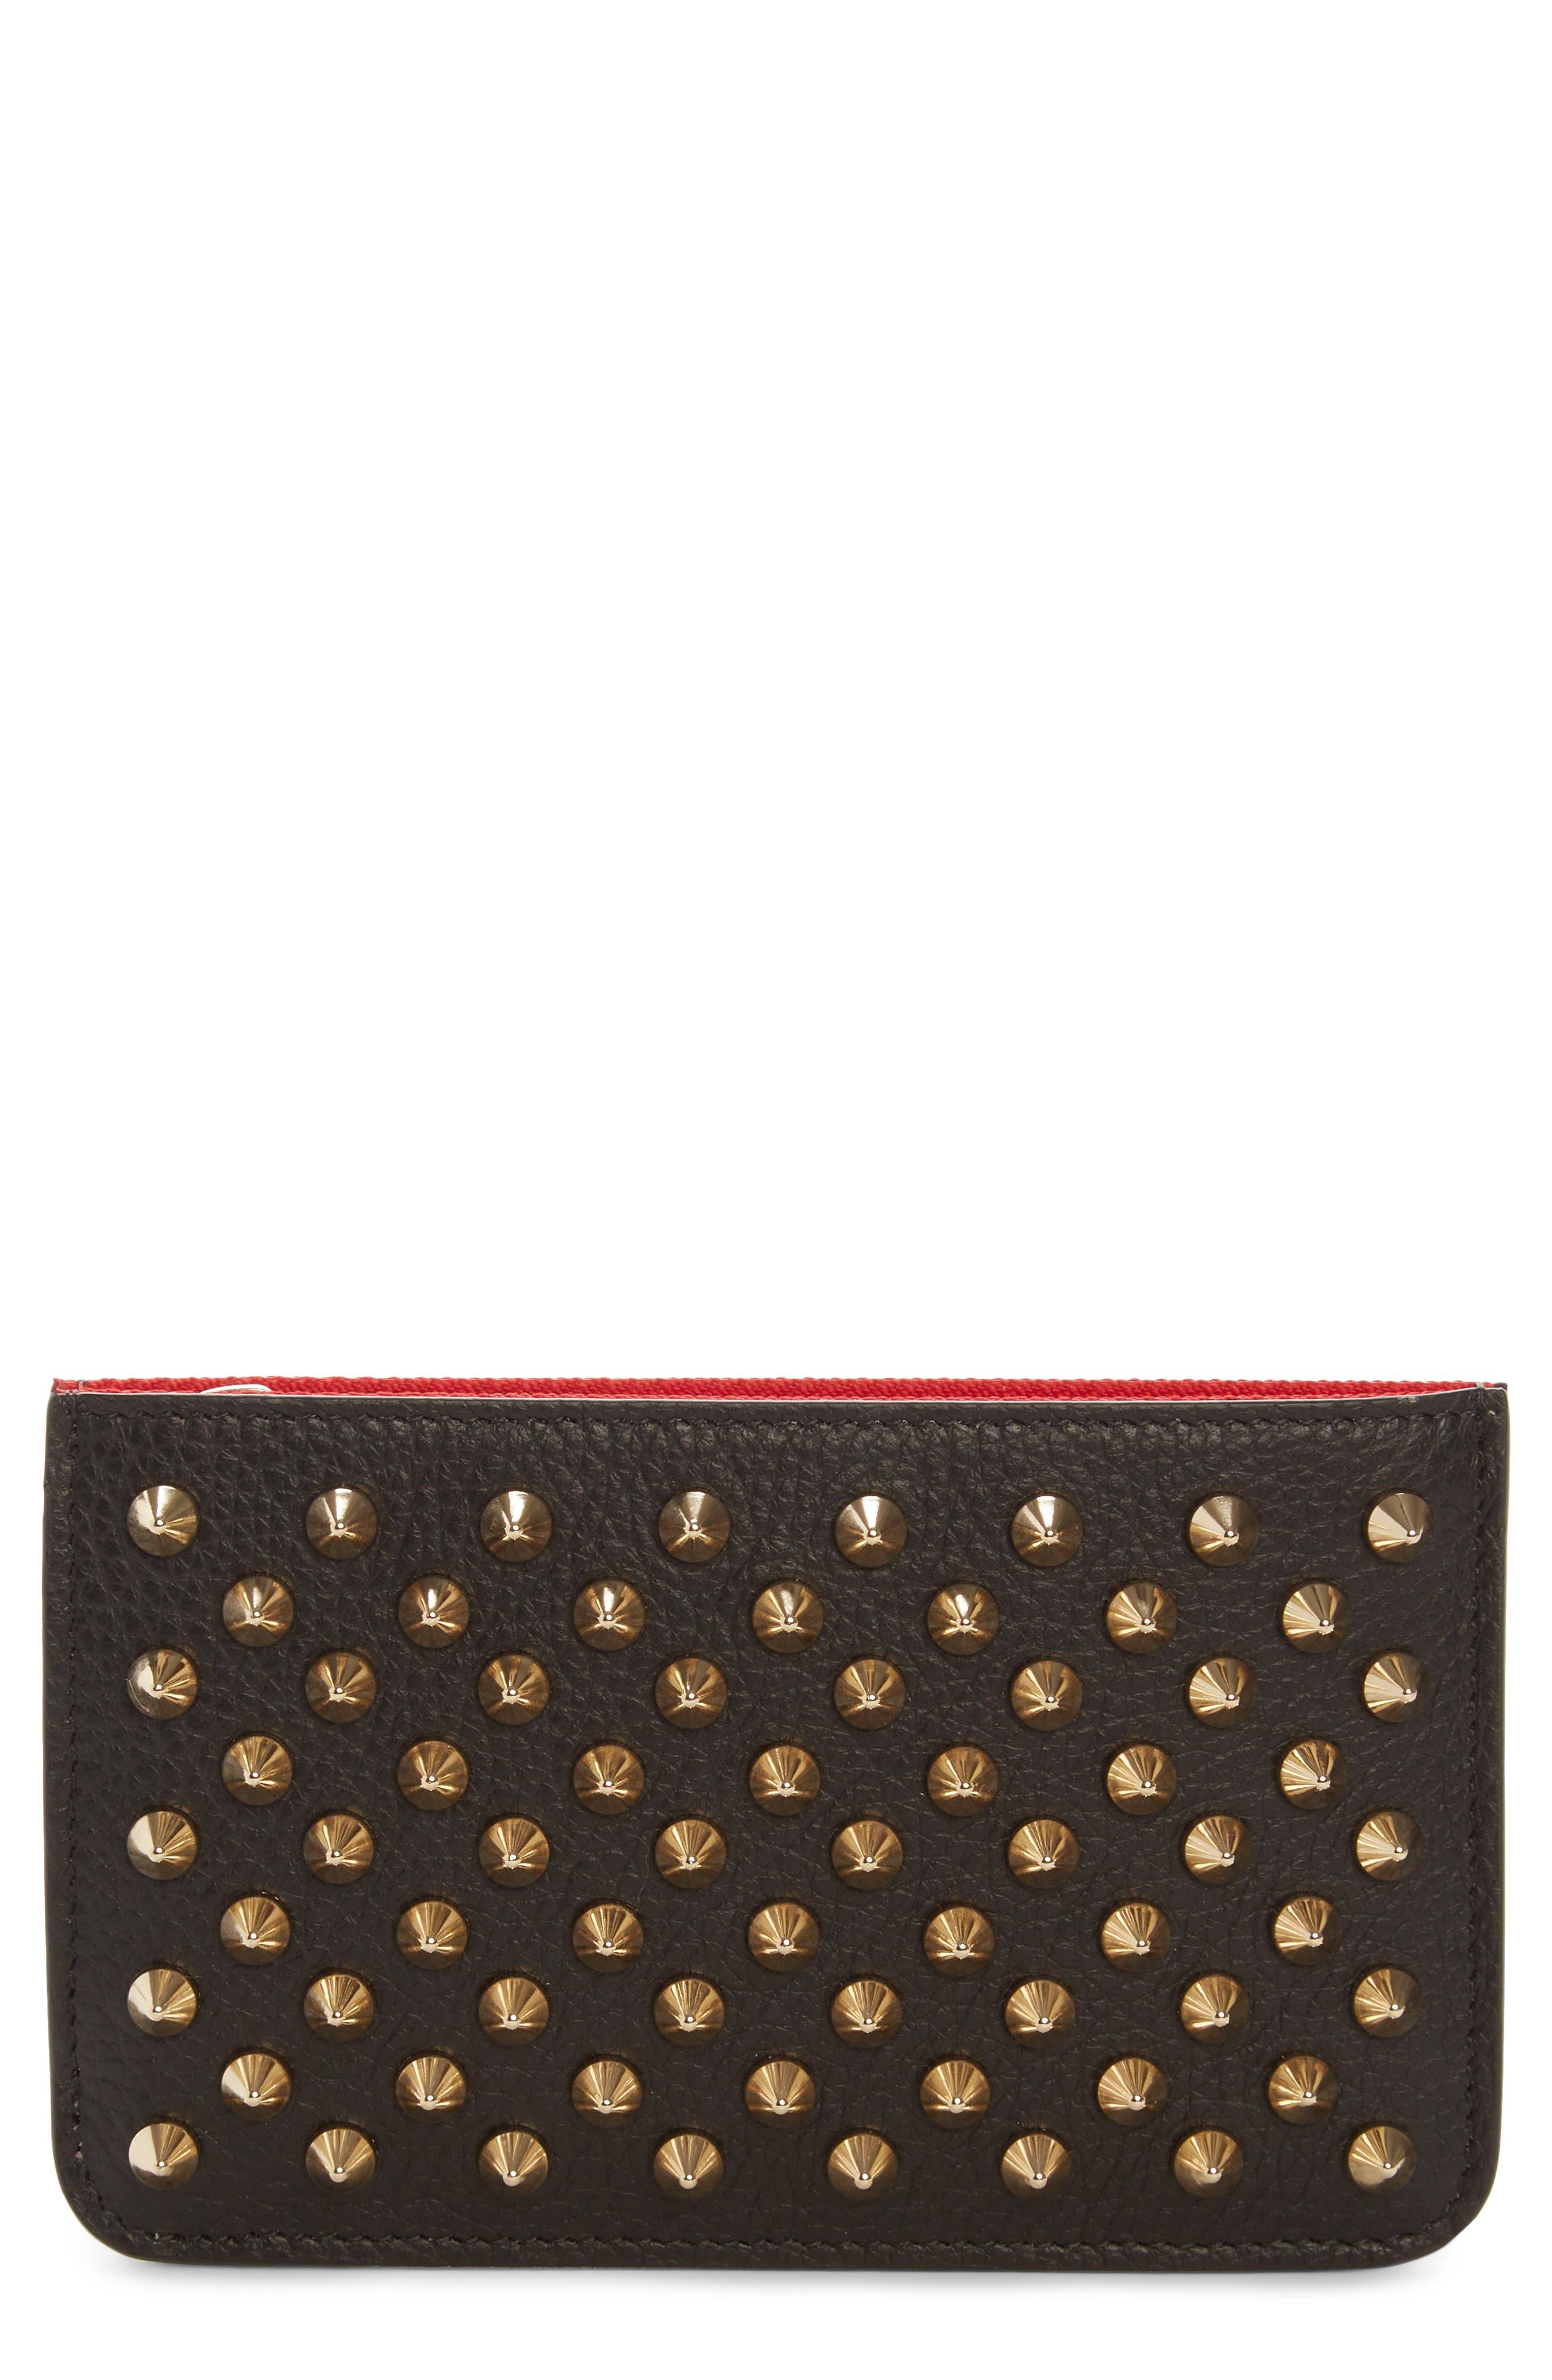 Christian Louboutin Panettone Studded Leather Key Case